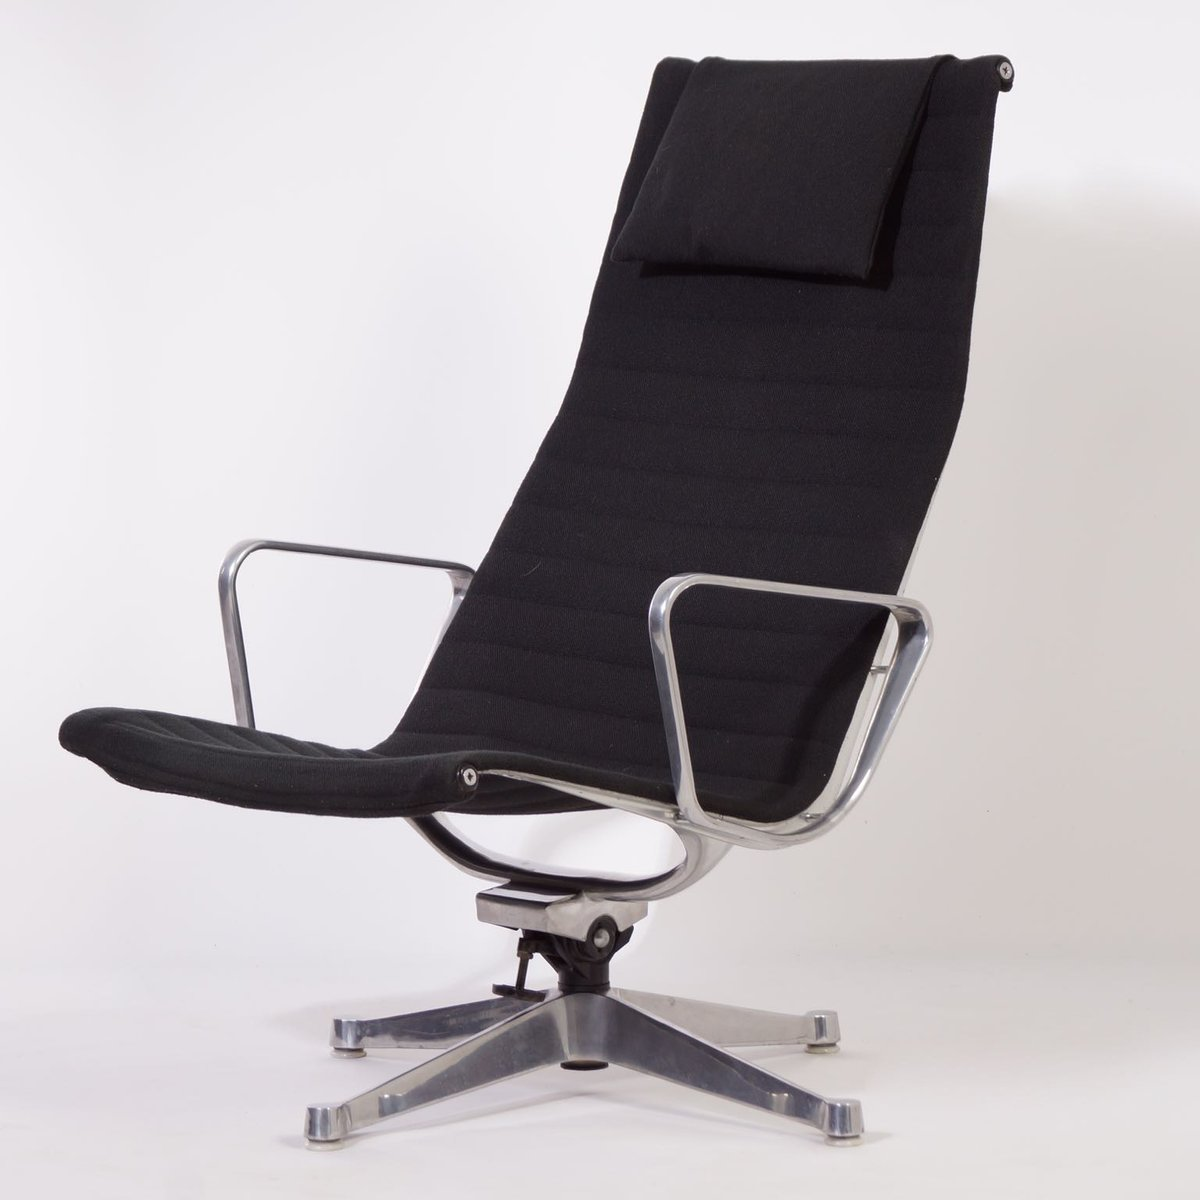 ea124 sessel von charles und ray eames f r herman miller 1958 bei pamono kaufen. Black Bedroom Furniture Sets. Home Design Ideas